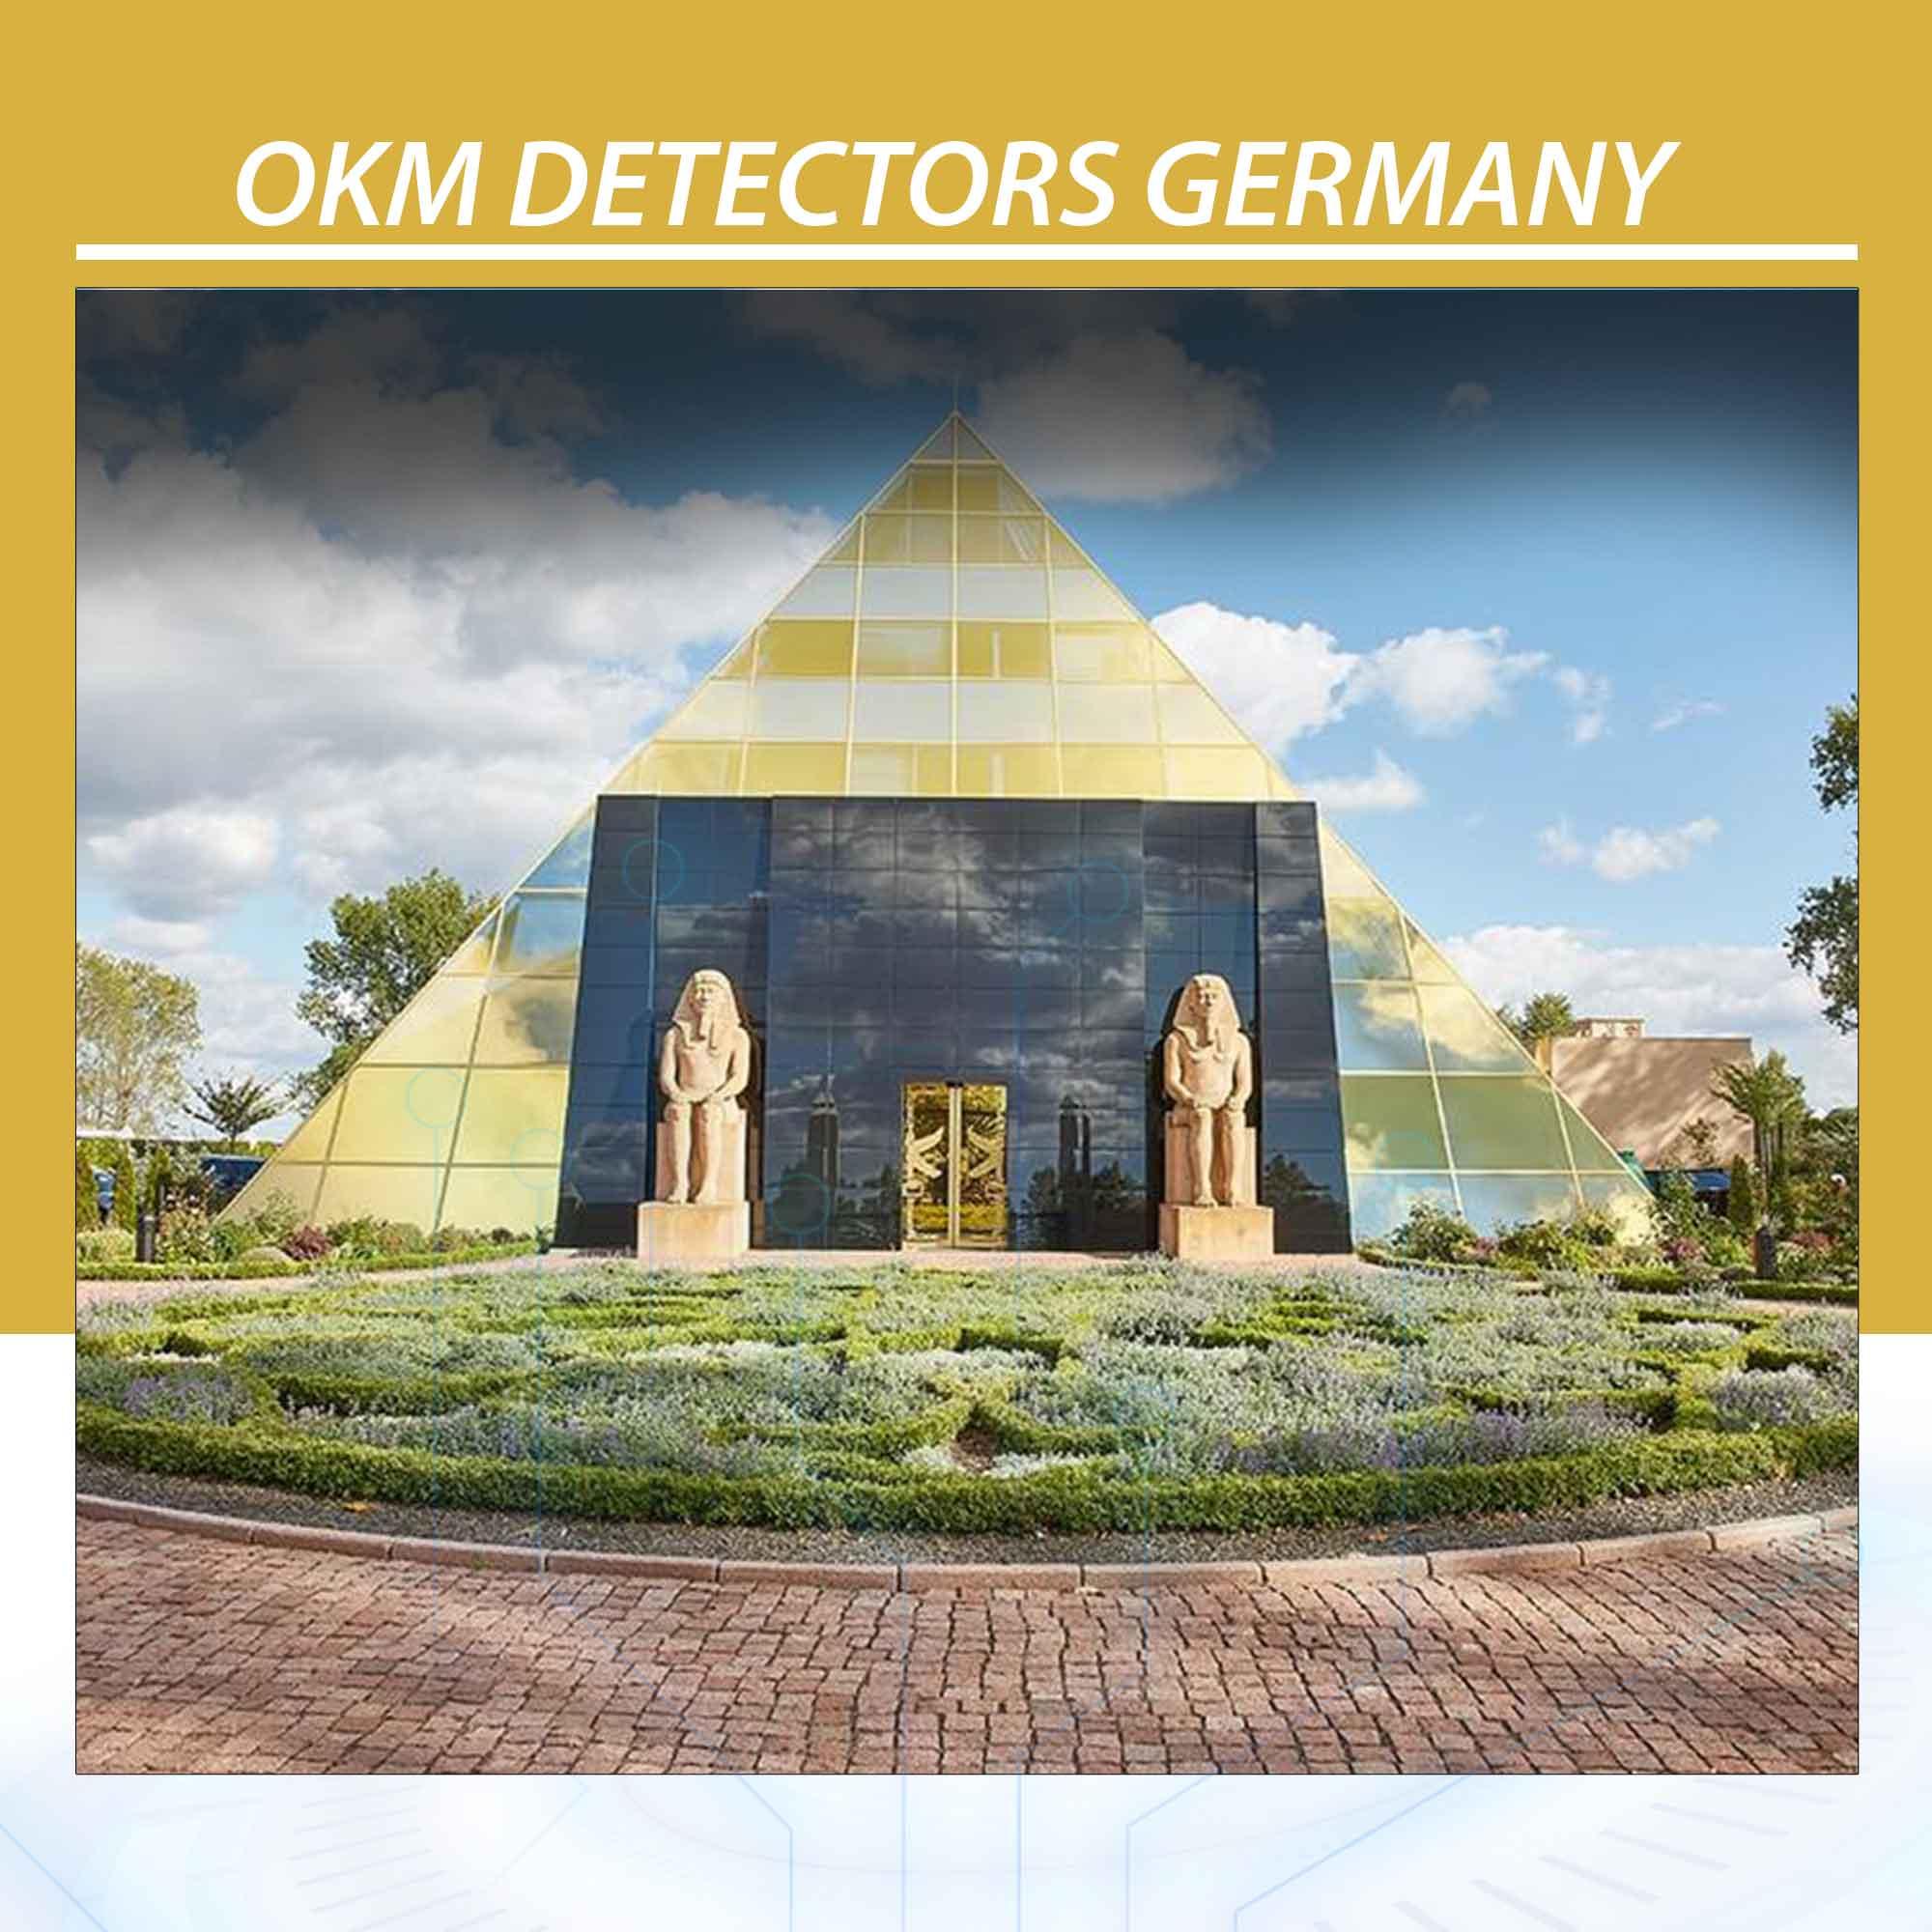 OKM Detectors Germany